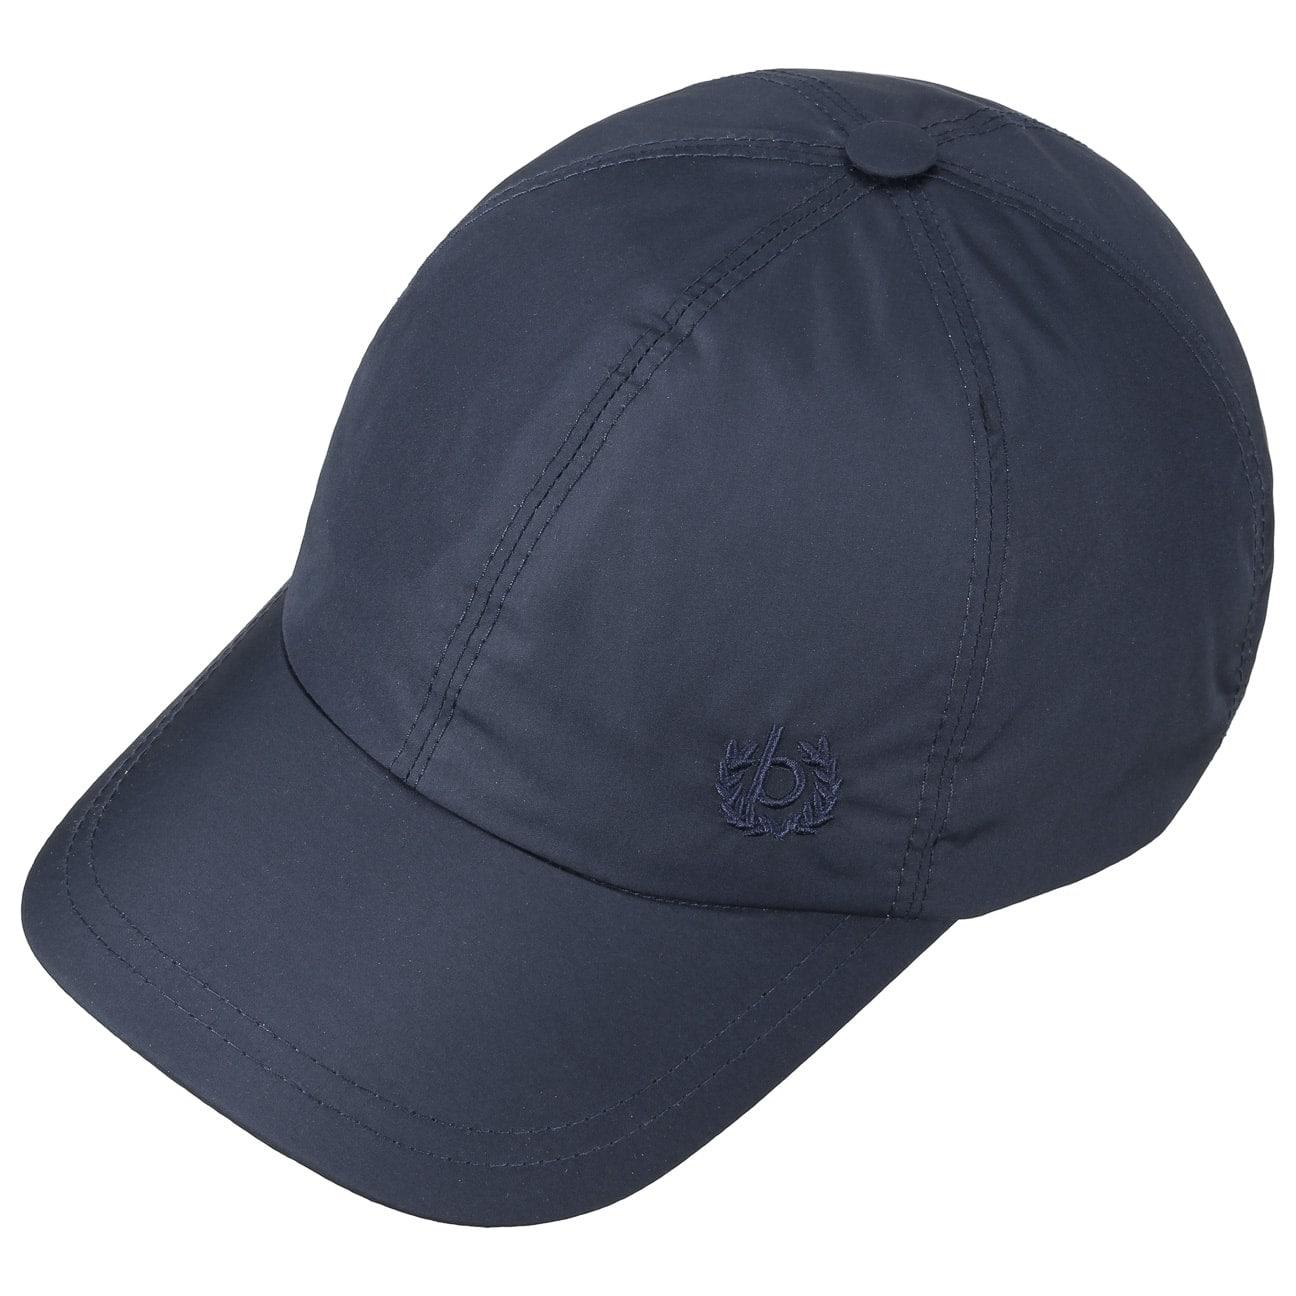 ... Casual Gore-Tex Baseball Cap by bugatti - blu 2 ... 66ea3ae7485b